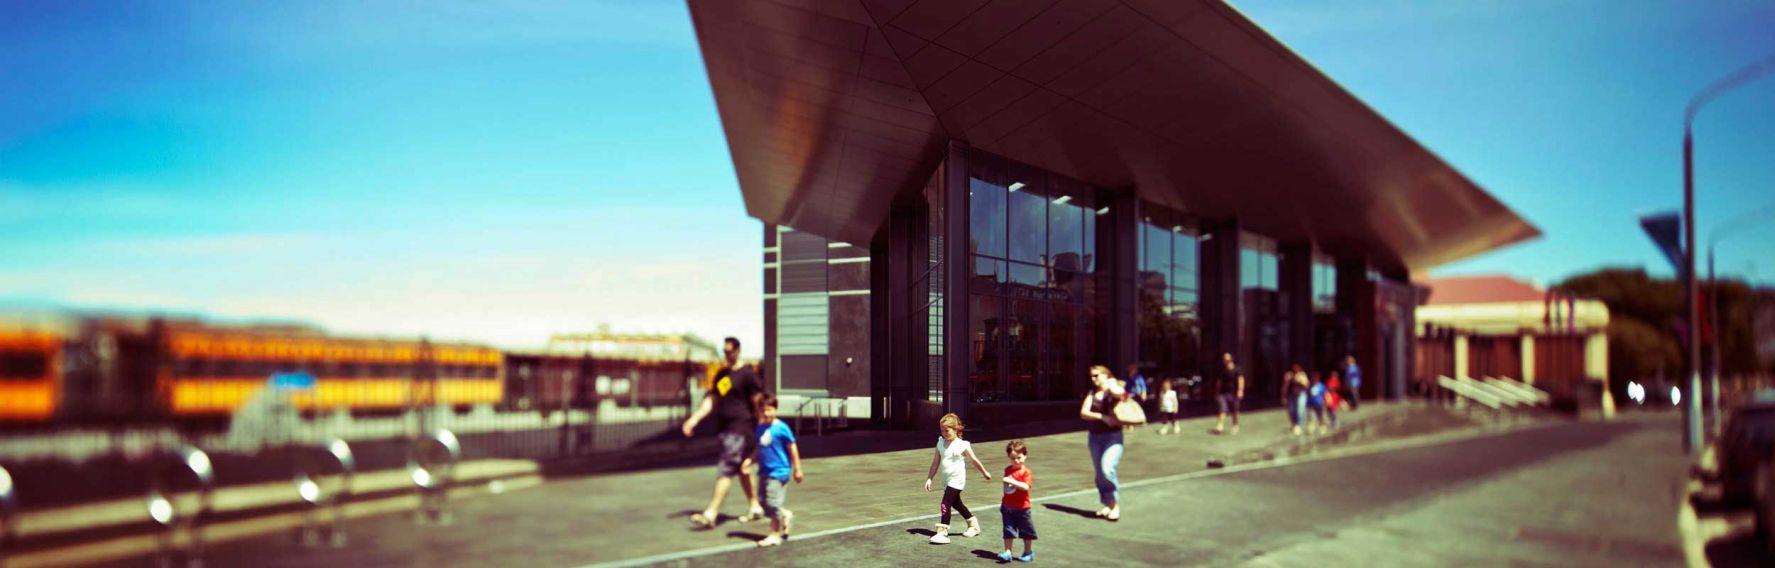 Outside Toitu Otago Settlers Museum